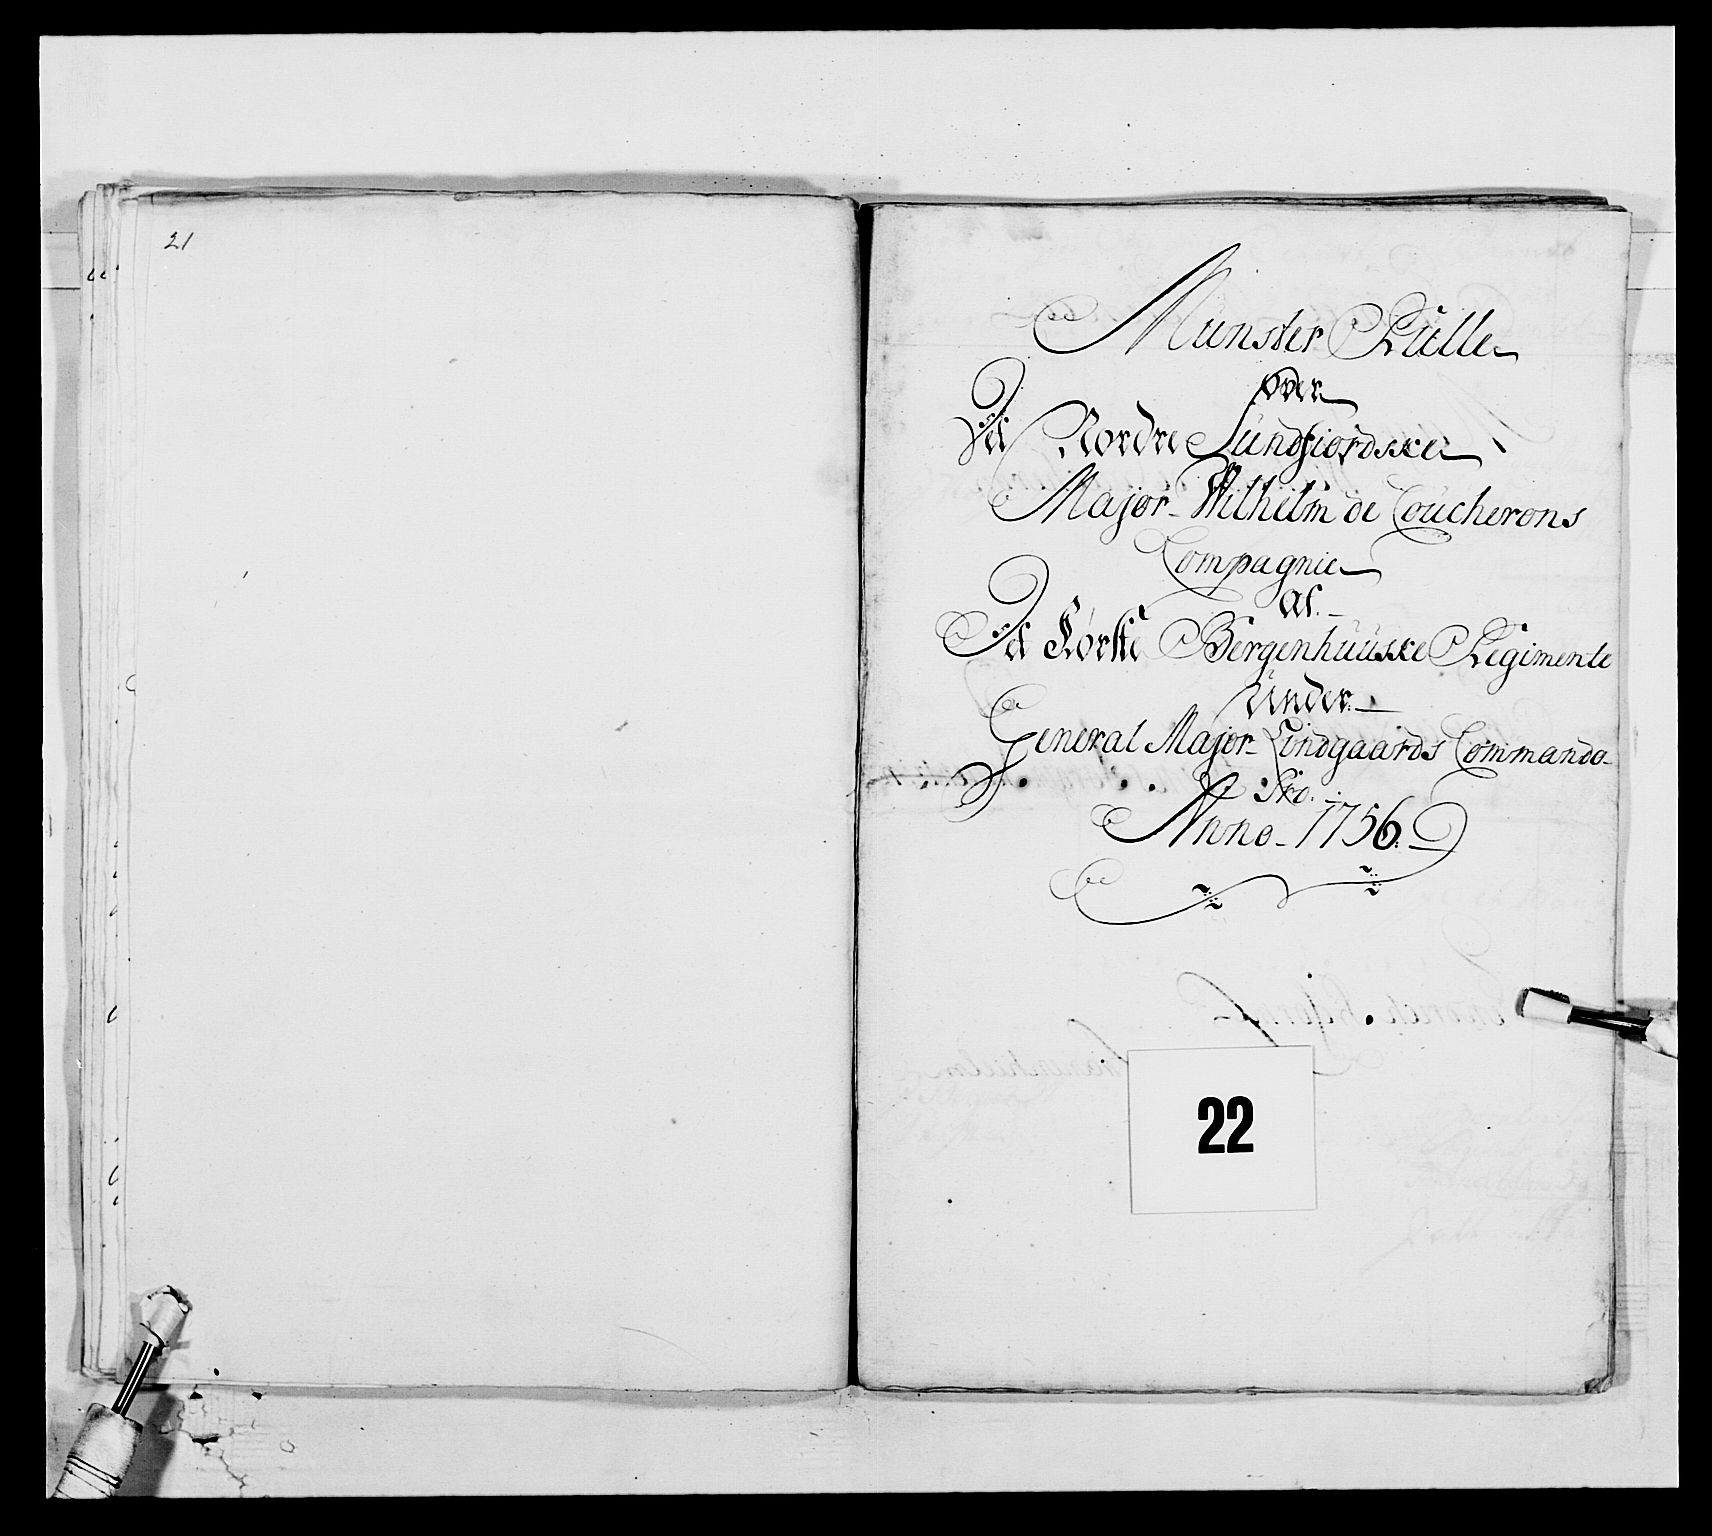 RA, Kommanderende general (KG I) med Det norske krigsdirektorium, E/Ea/L0517: 1. Bergenhusiske regiment, 1742-1756, s. 286